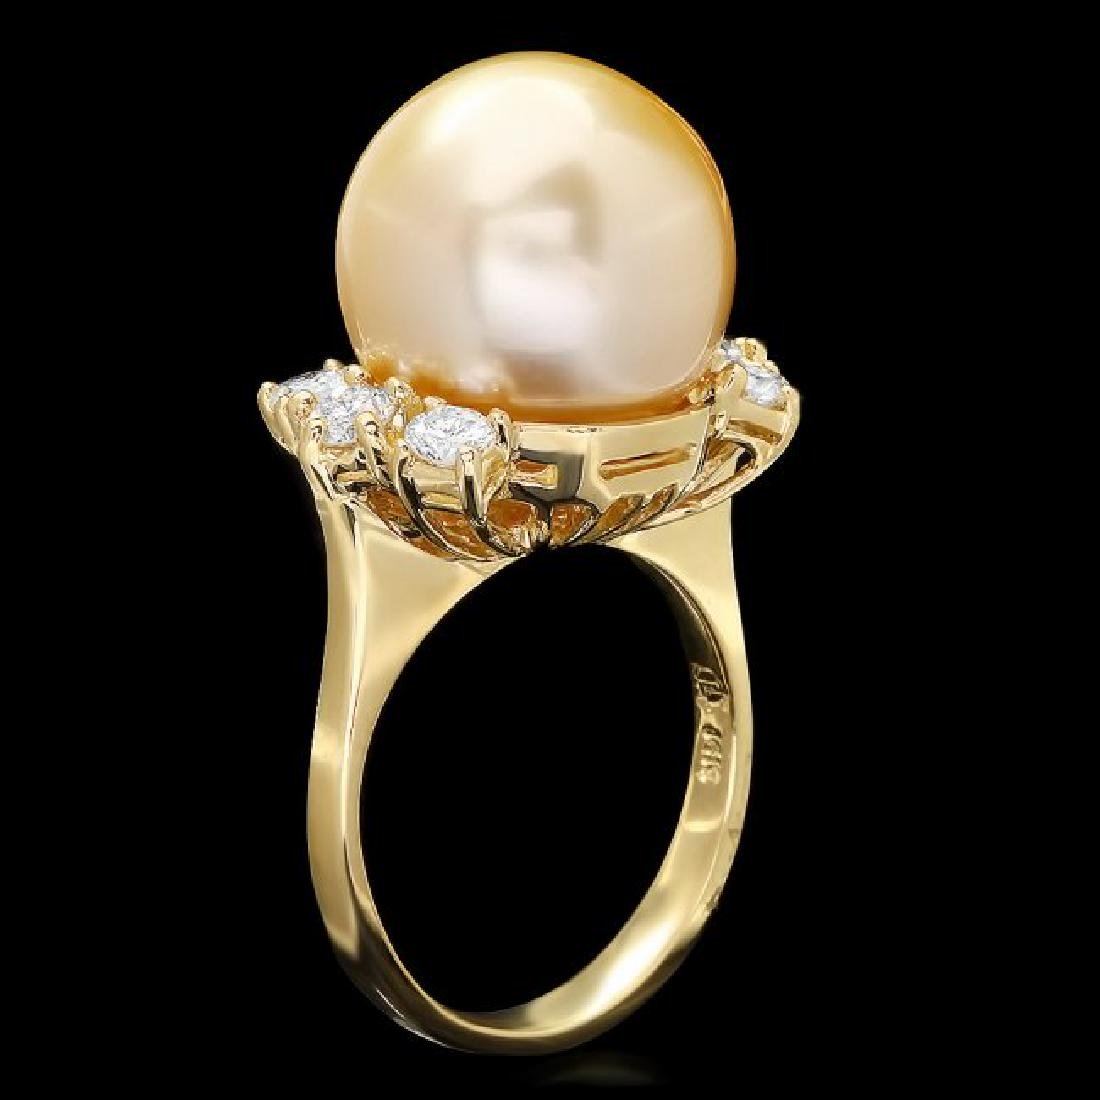 14k Gold 14 X 14mm Pearl 0.80ct Diamond Ring - 2